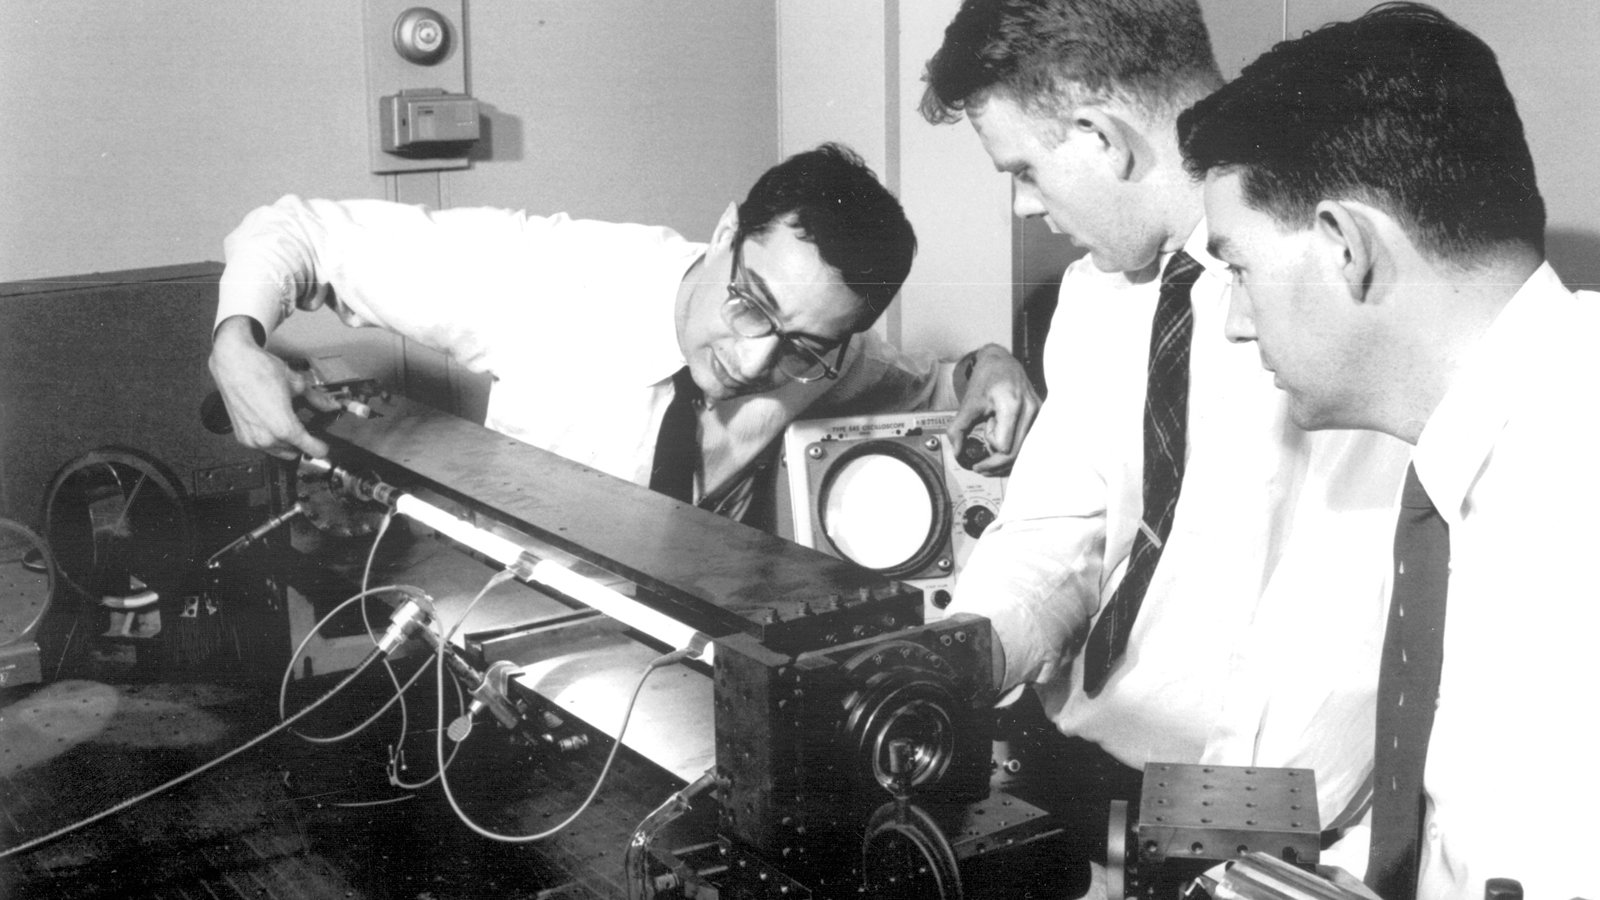 sejarah teknologi laser